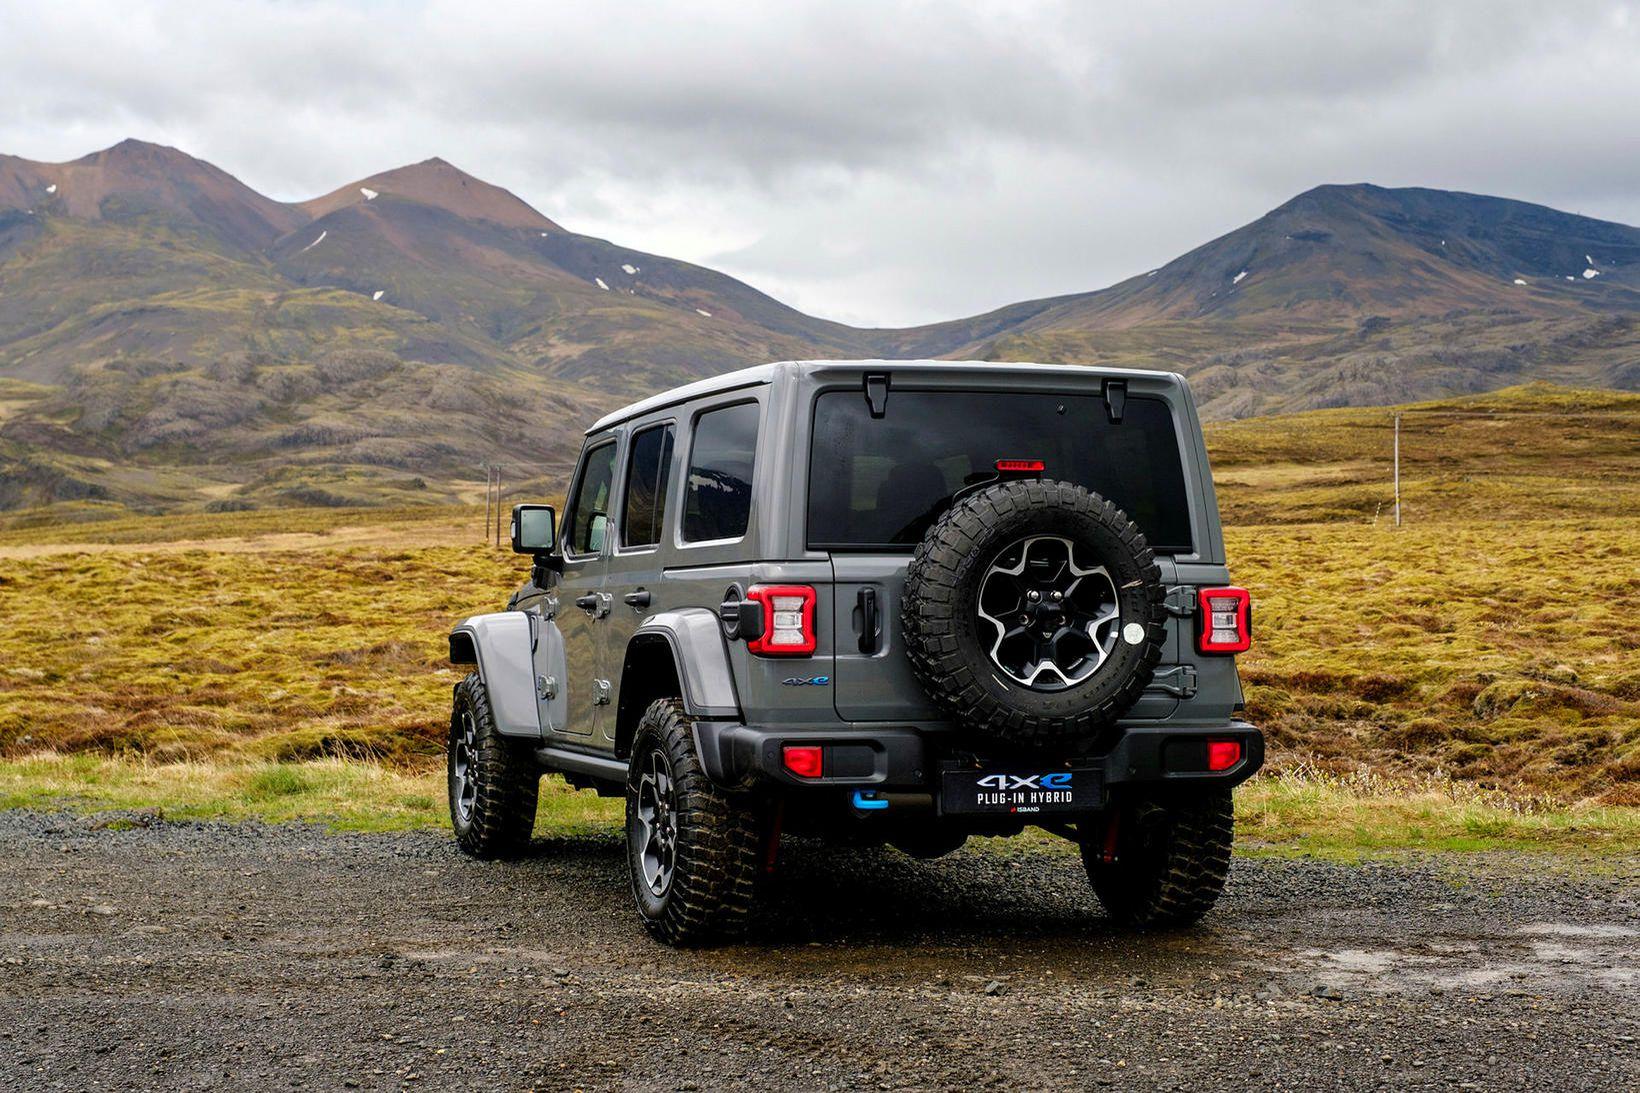 Maður lítur vel út á malbikinu á Jeep Wrangler Rubicon …